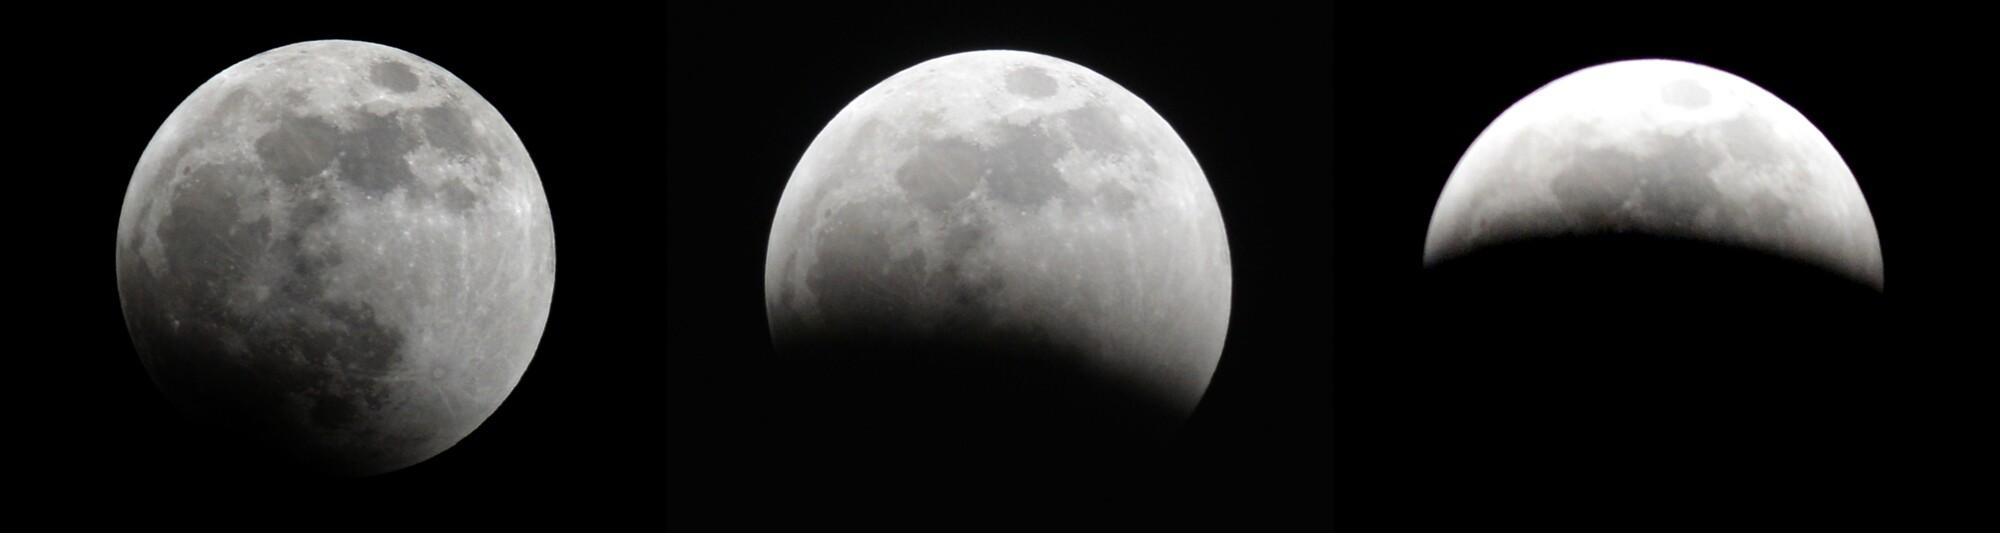 mooncomposite-1st3.jpg